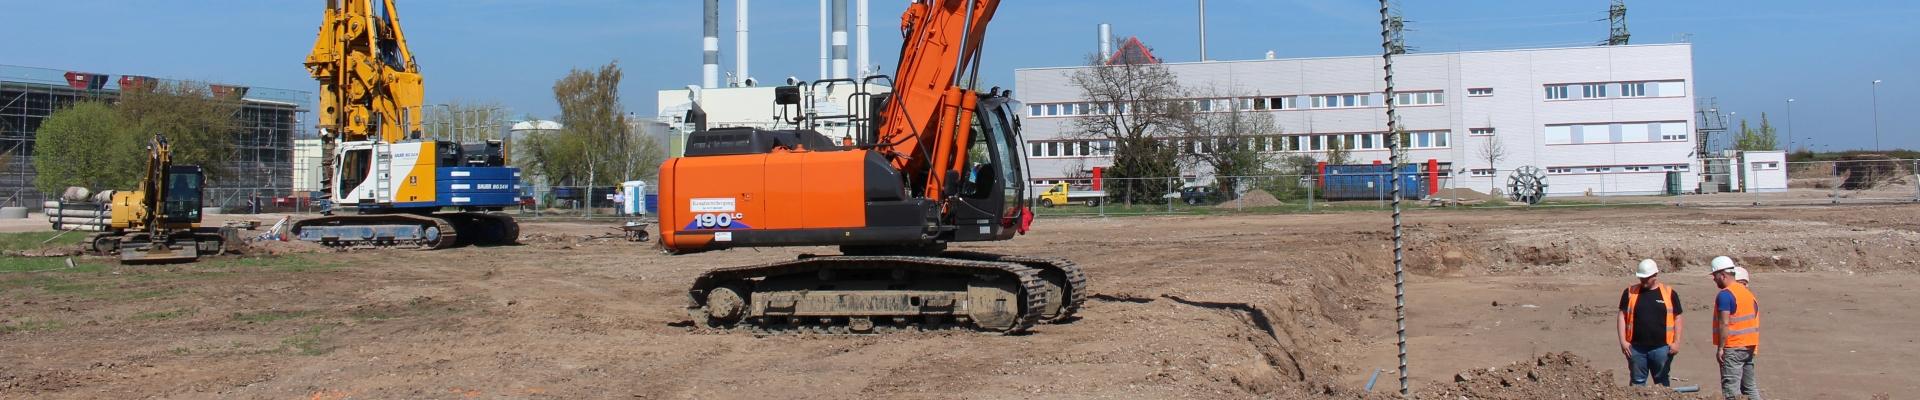 Baugrund JACOBI Erfurt Baubegleitung